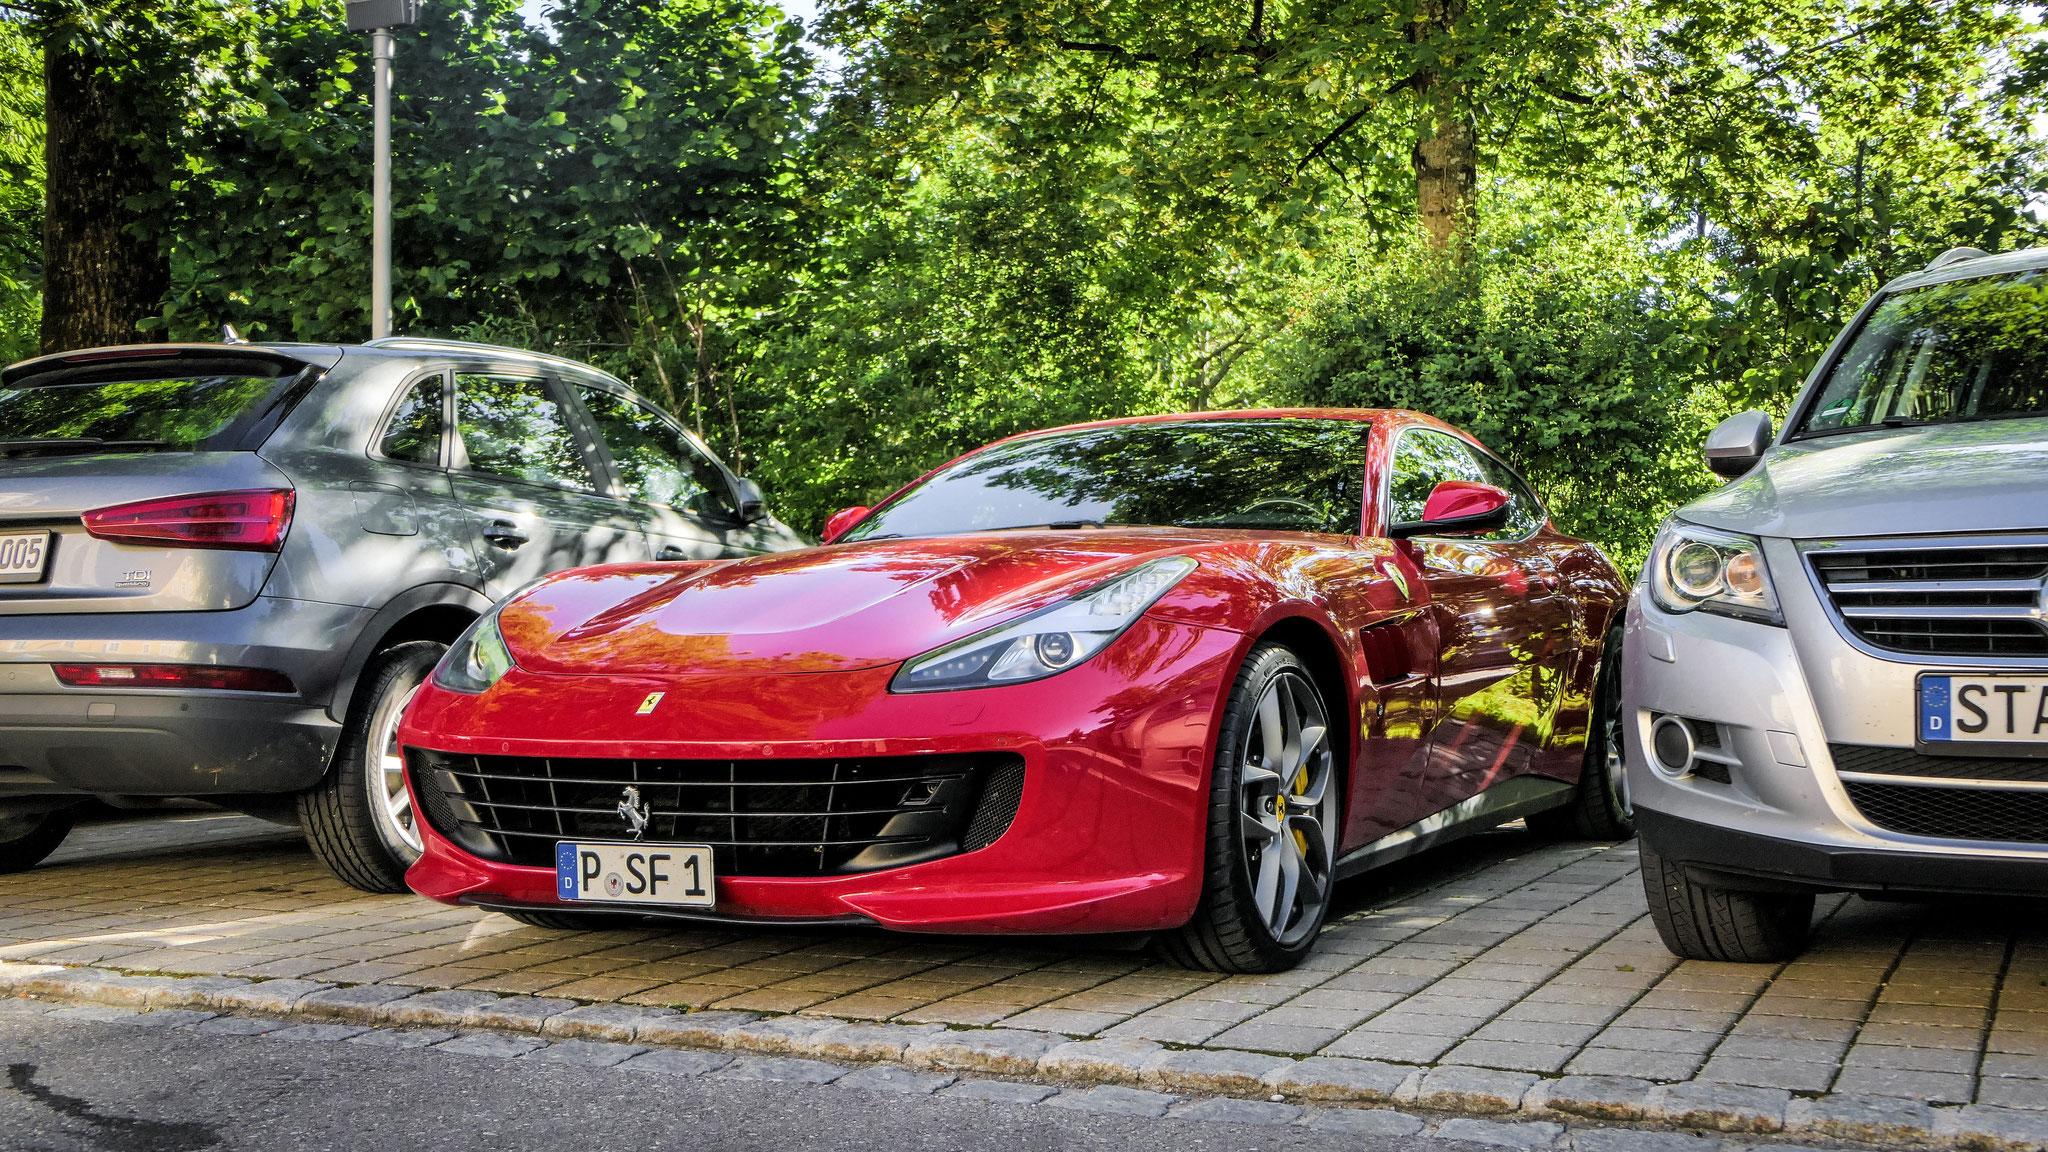 Ferrari GTC4 Lusso - P-SF-1